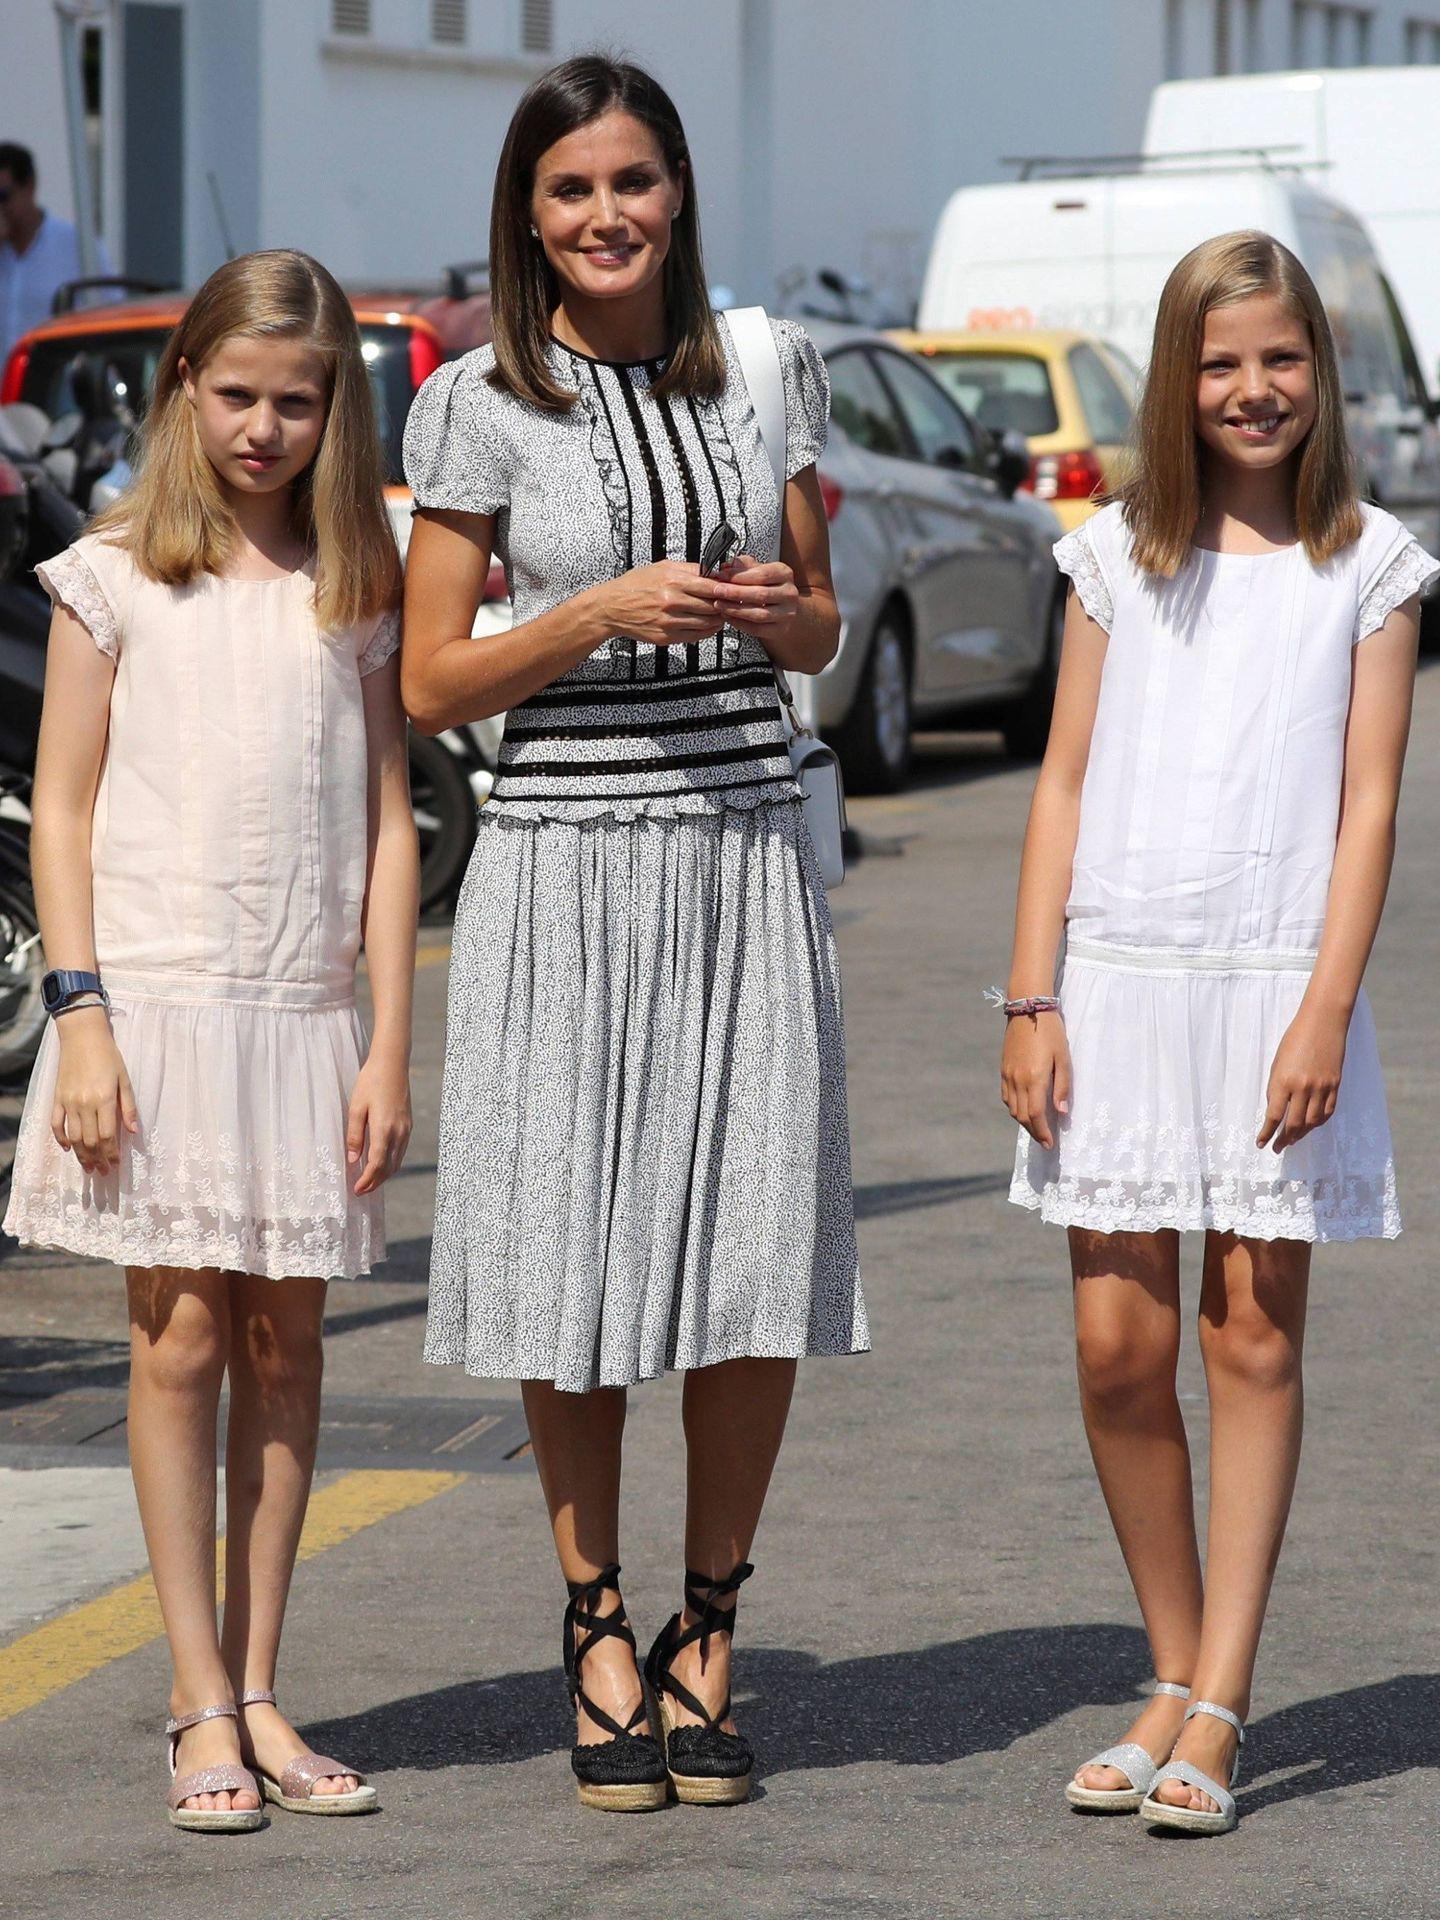 La reina, con sus hijas, posando para la prensa. (EFE)